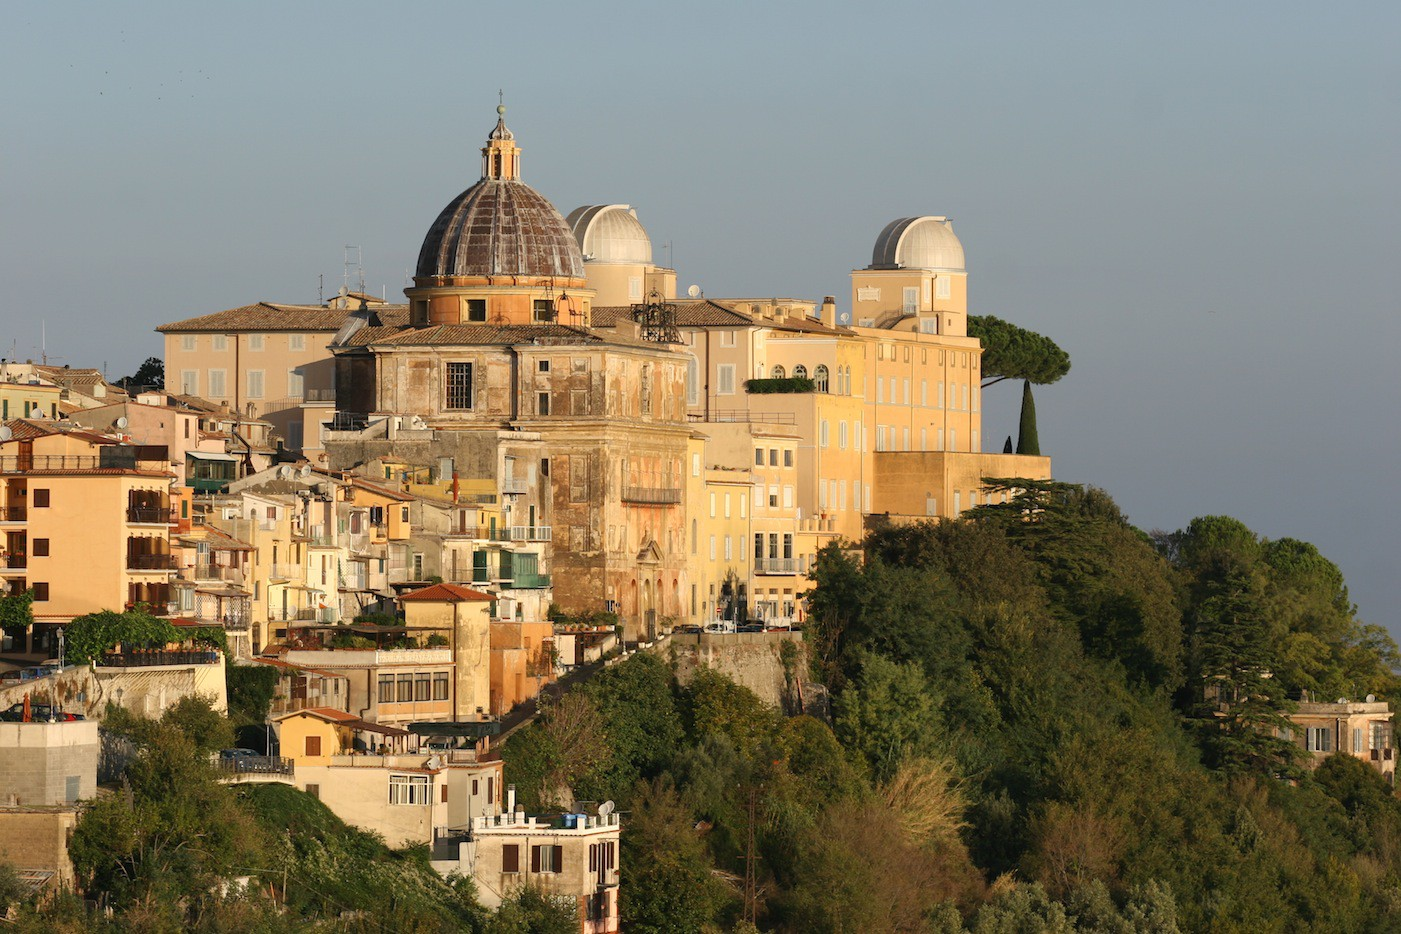 Roma Castelli Romani